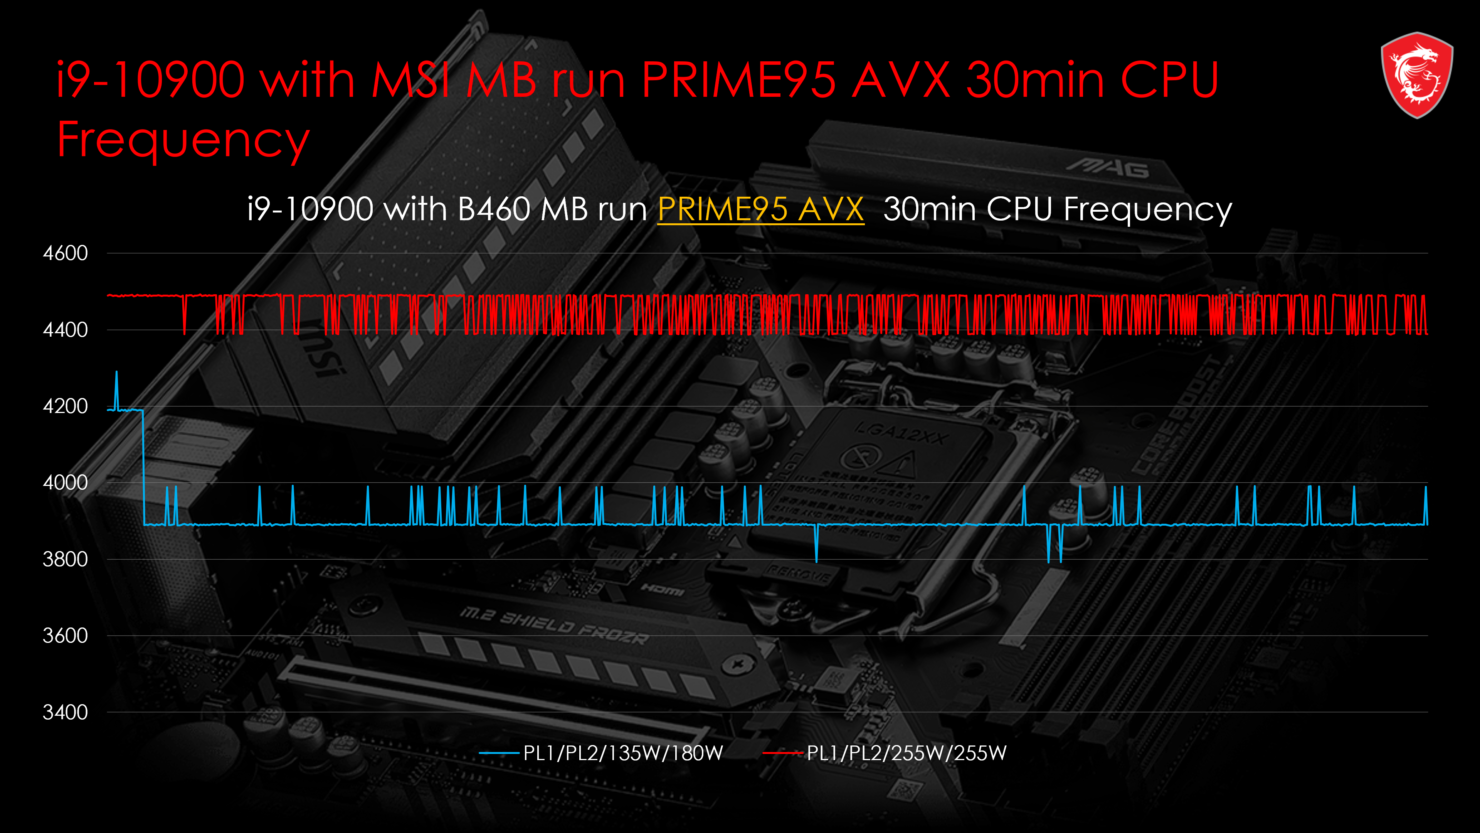 msi-non-k-cpu-overclock_b460_h410_motherboards_10th-gen-comet-lake_7